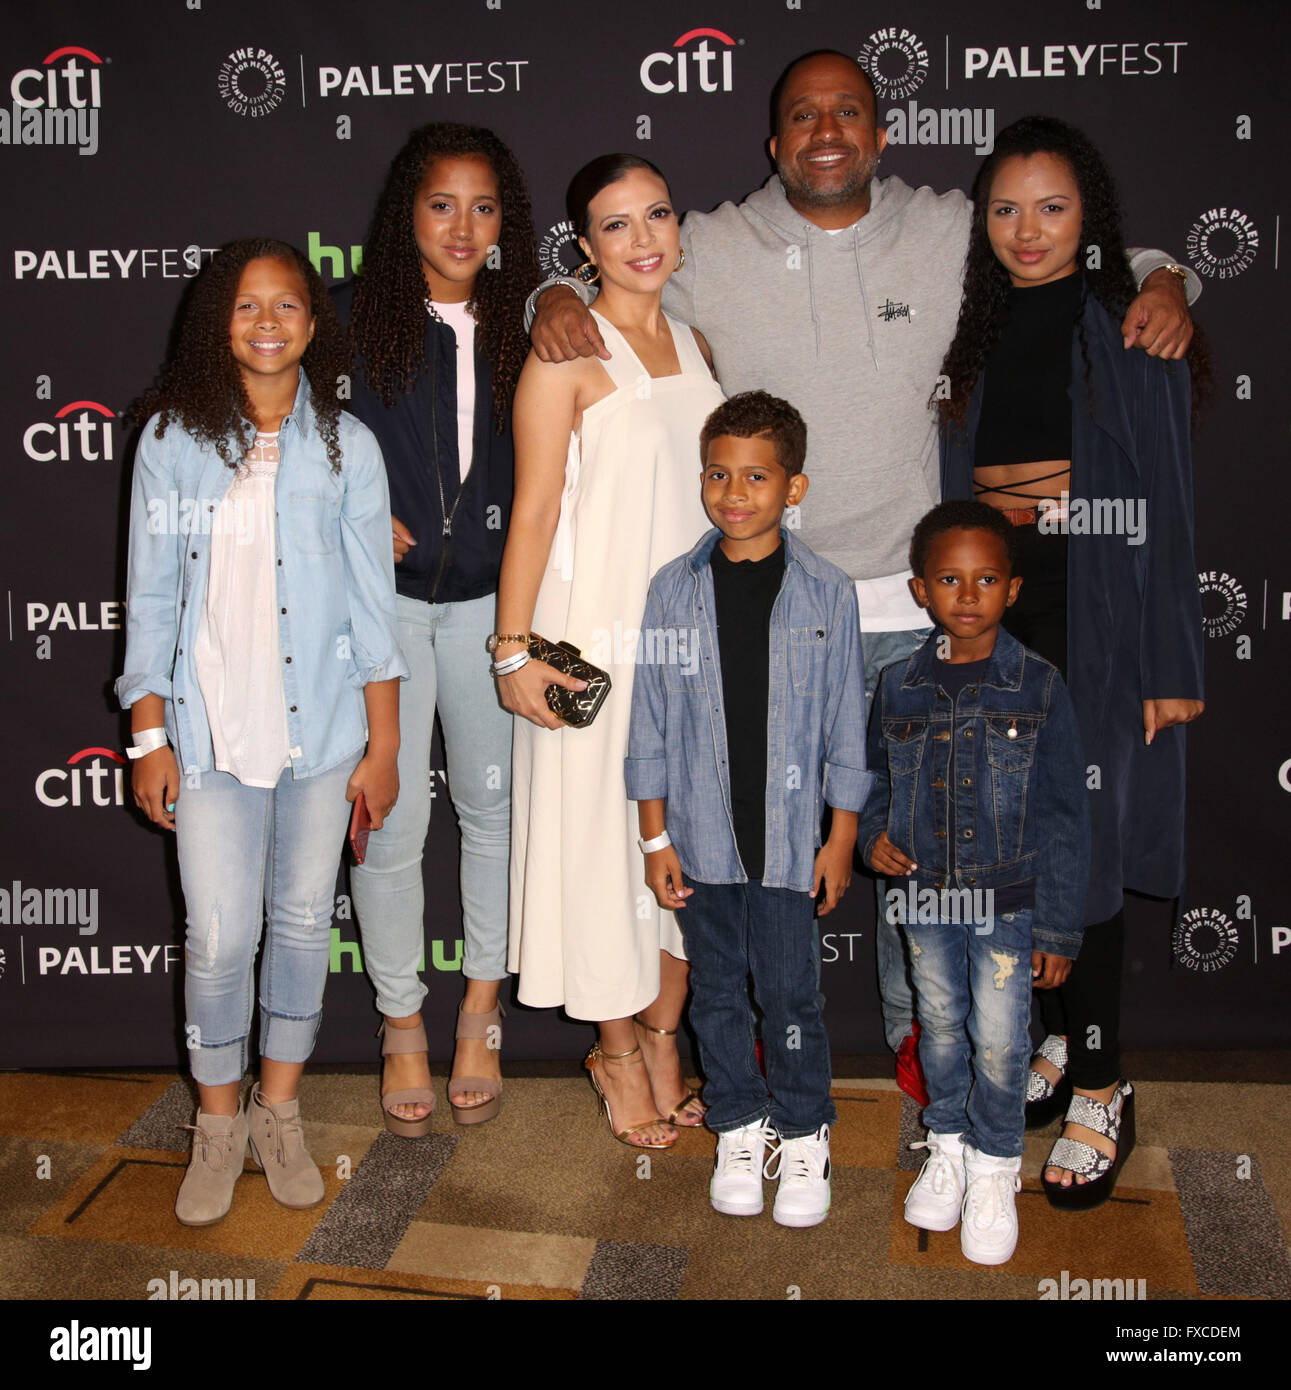 Celebrities Attend 33rd Annual Paleyfest Los Angeles